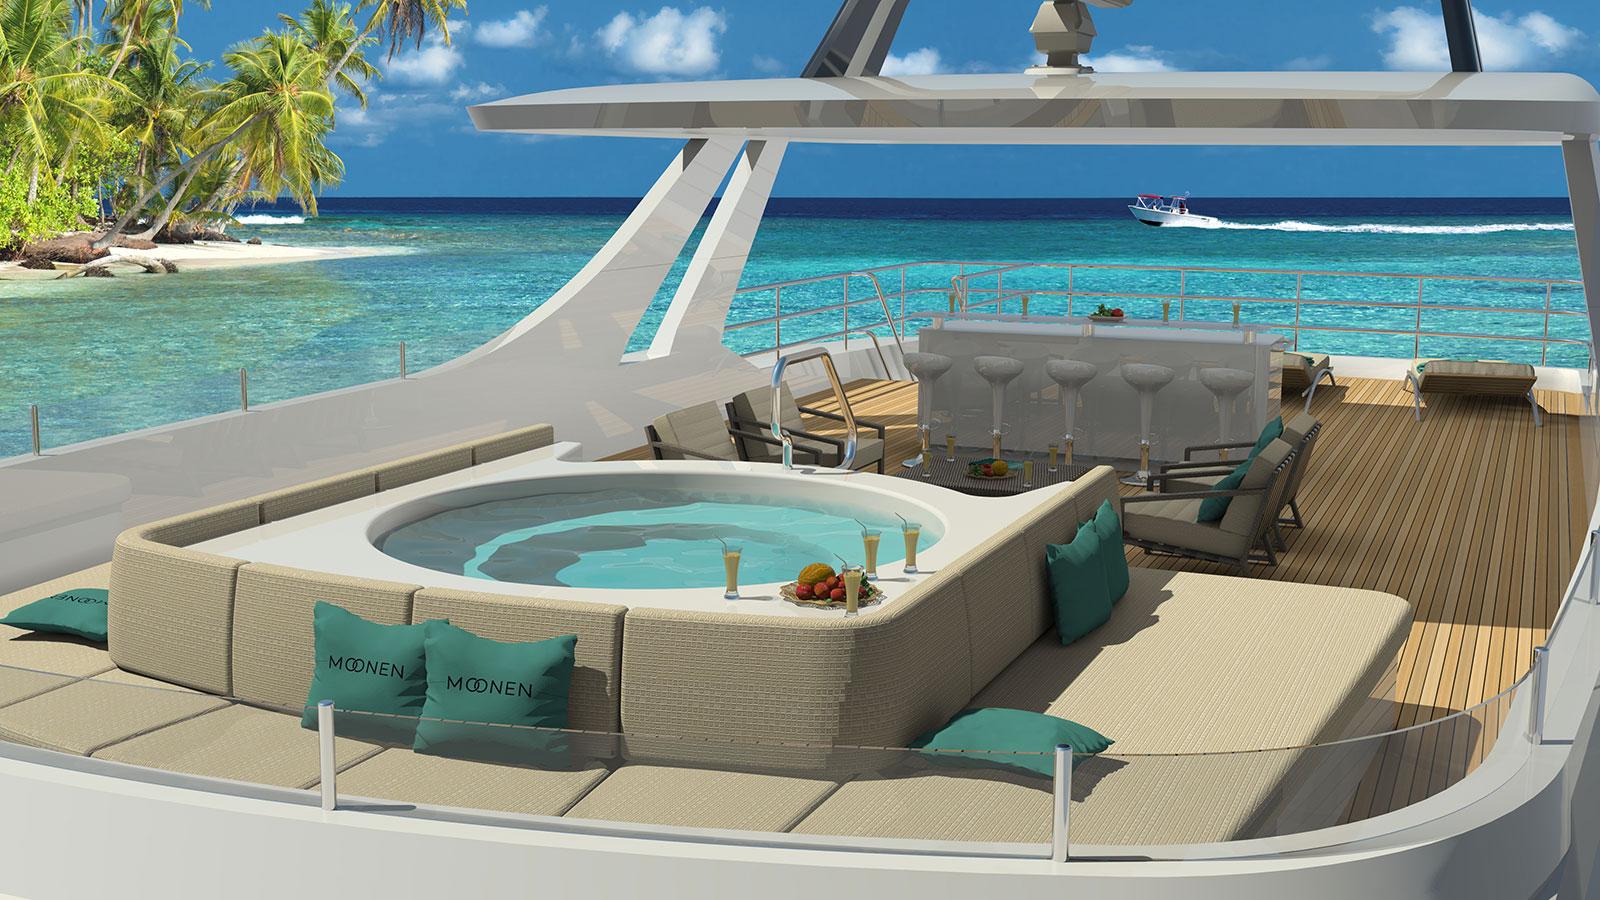 the-sun-deck-of-the-moonen-caribbean-yacht-monito